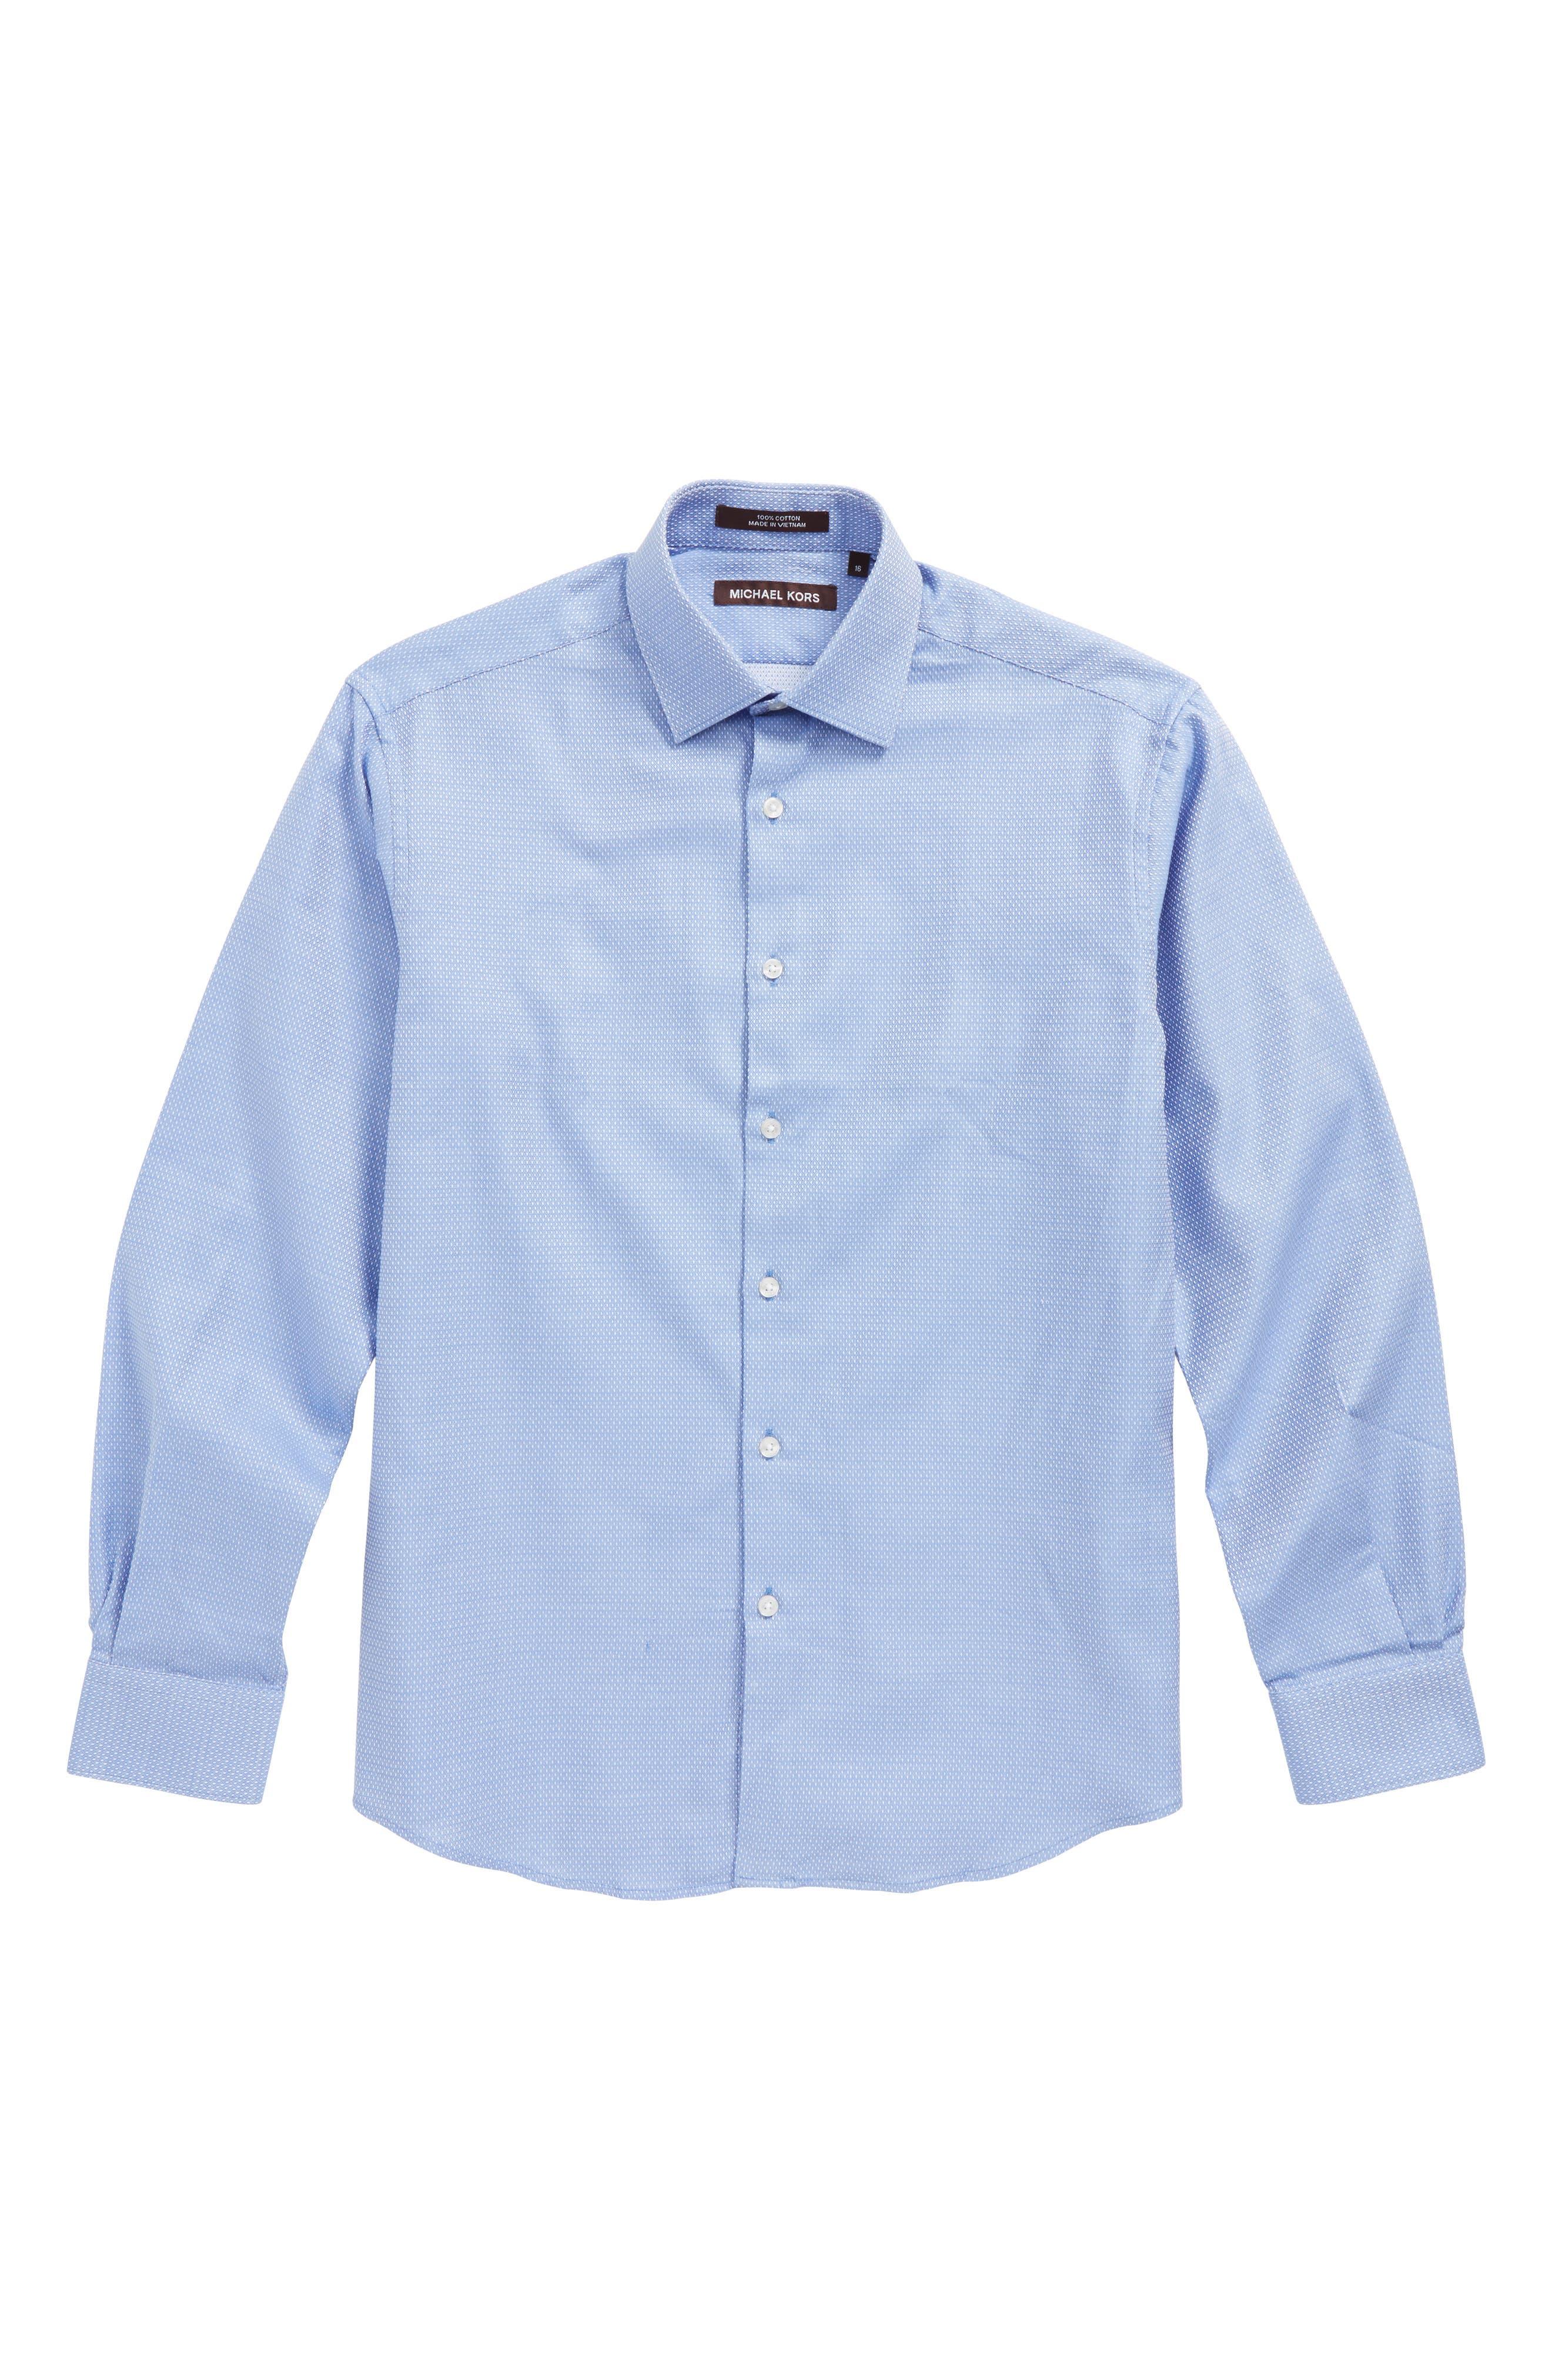 Main Image - Michael Kors Micro Dot Dress Shirt (Big Boys)